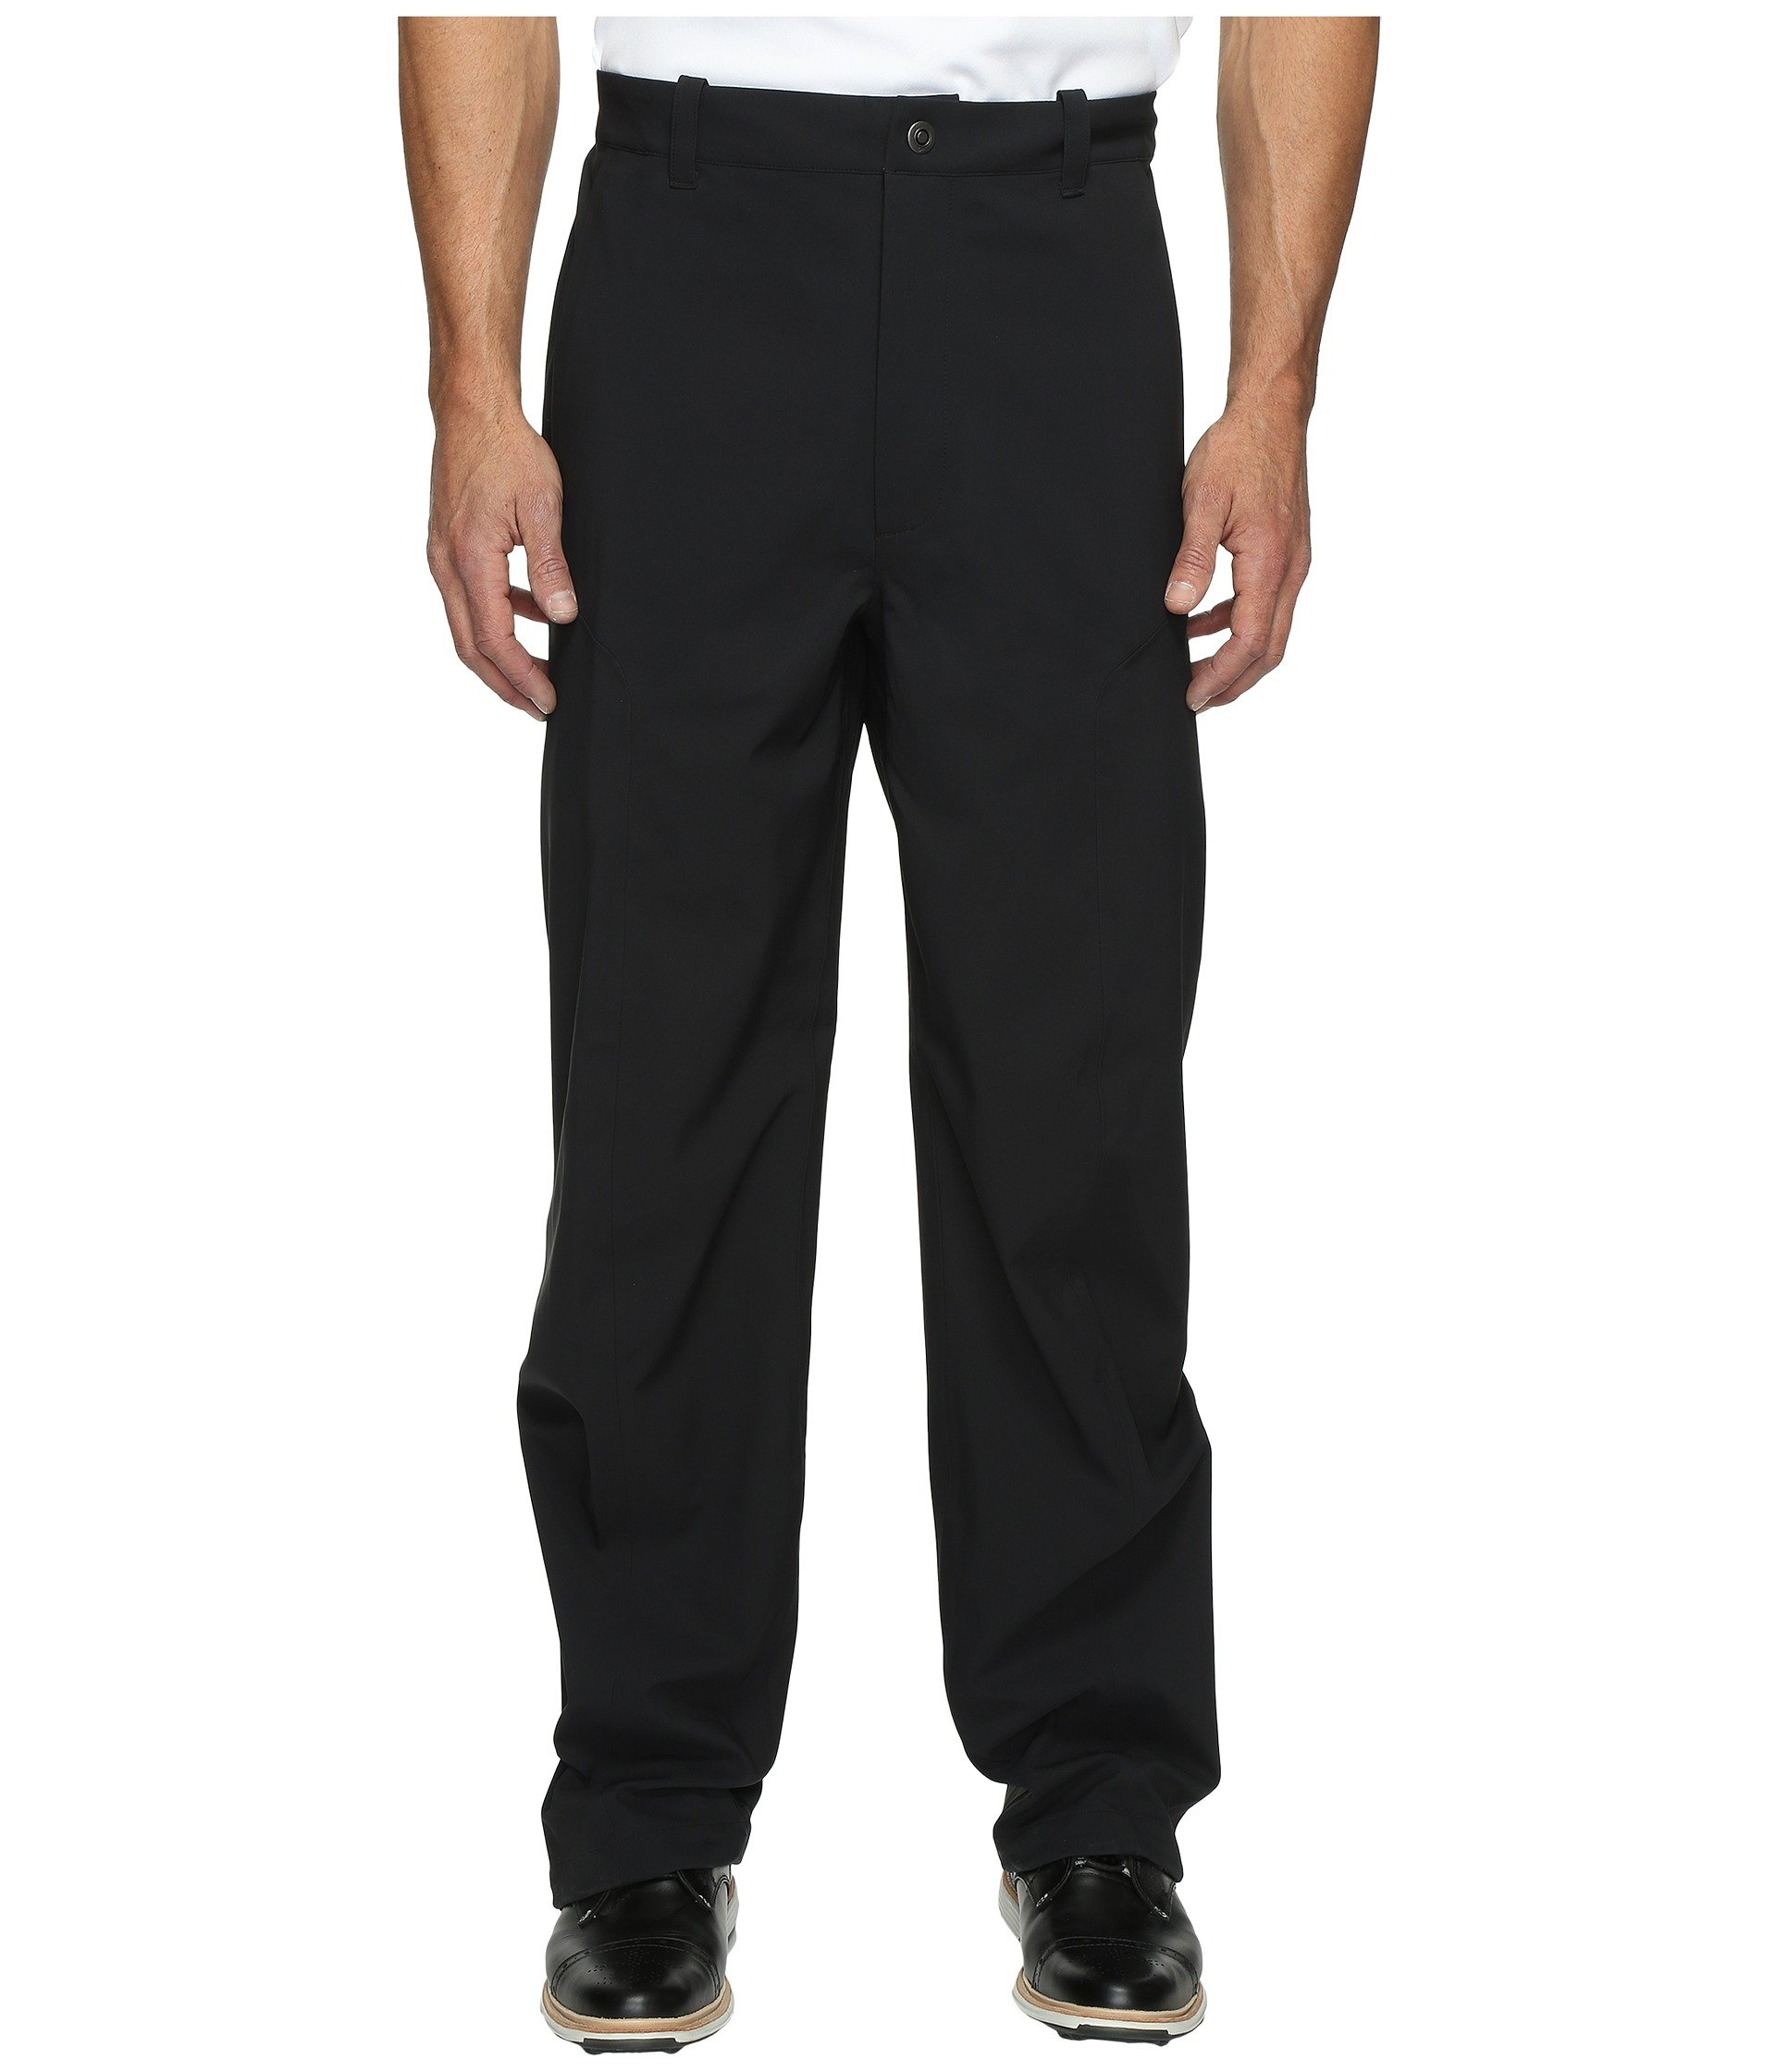 Nike Men's Hyper Storm-FIT Golf Pants by Nike Golf (Image #1)